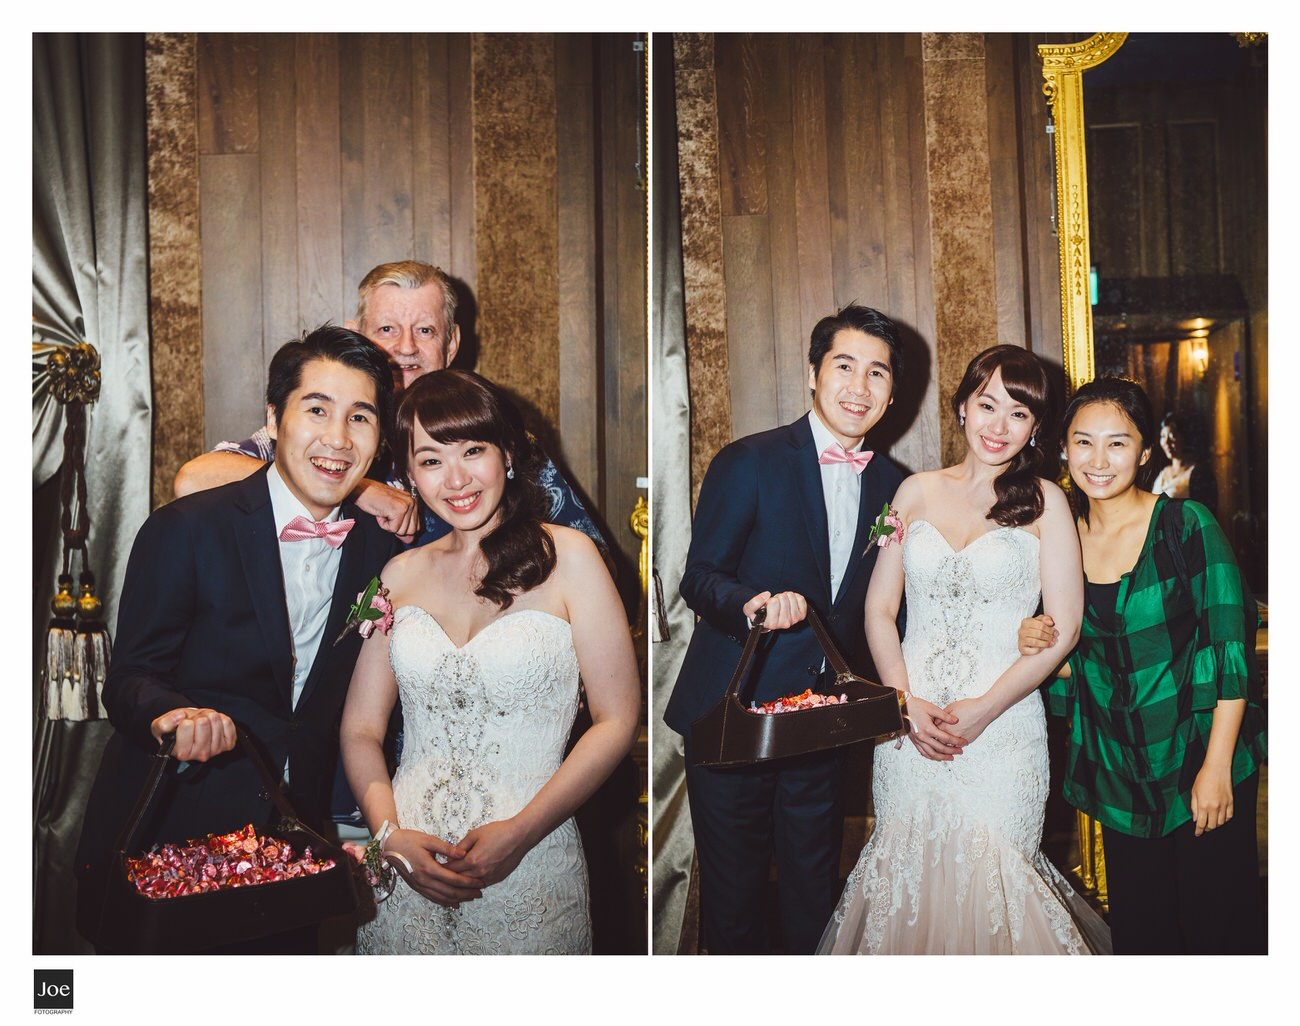 joe-fotography-wedding-photo-palais-de-chine-hotel-056.jpg